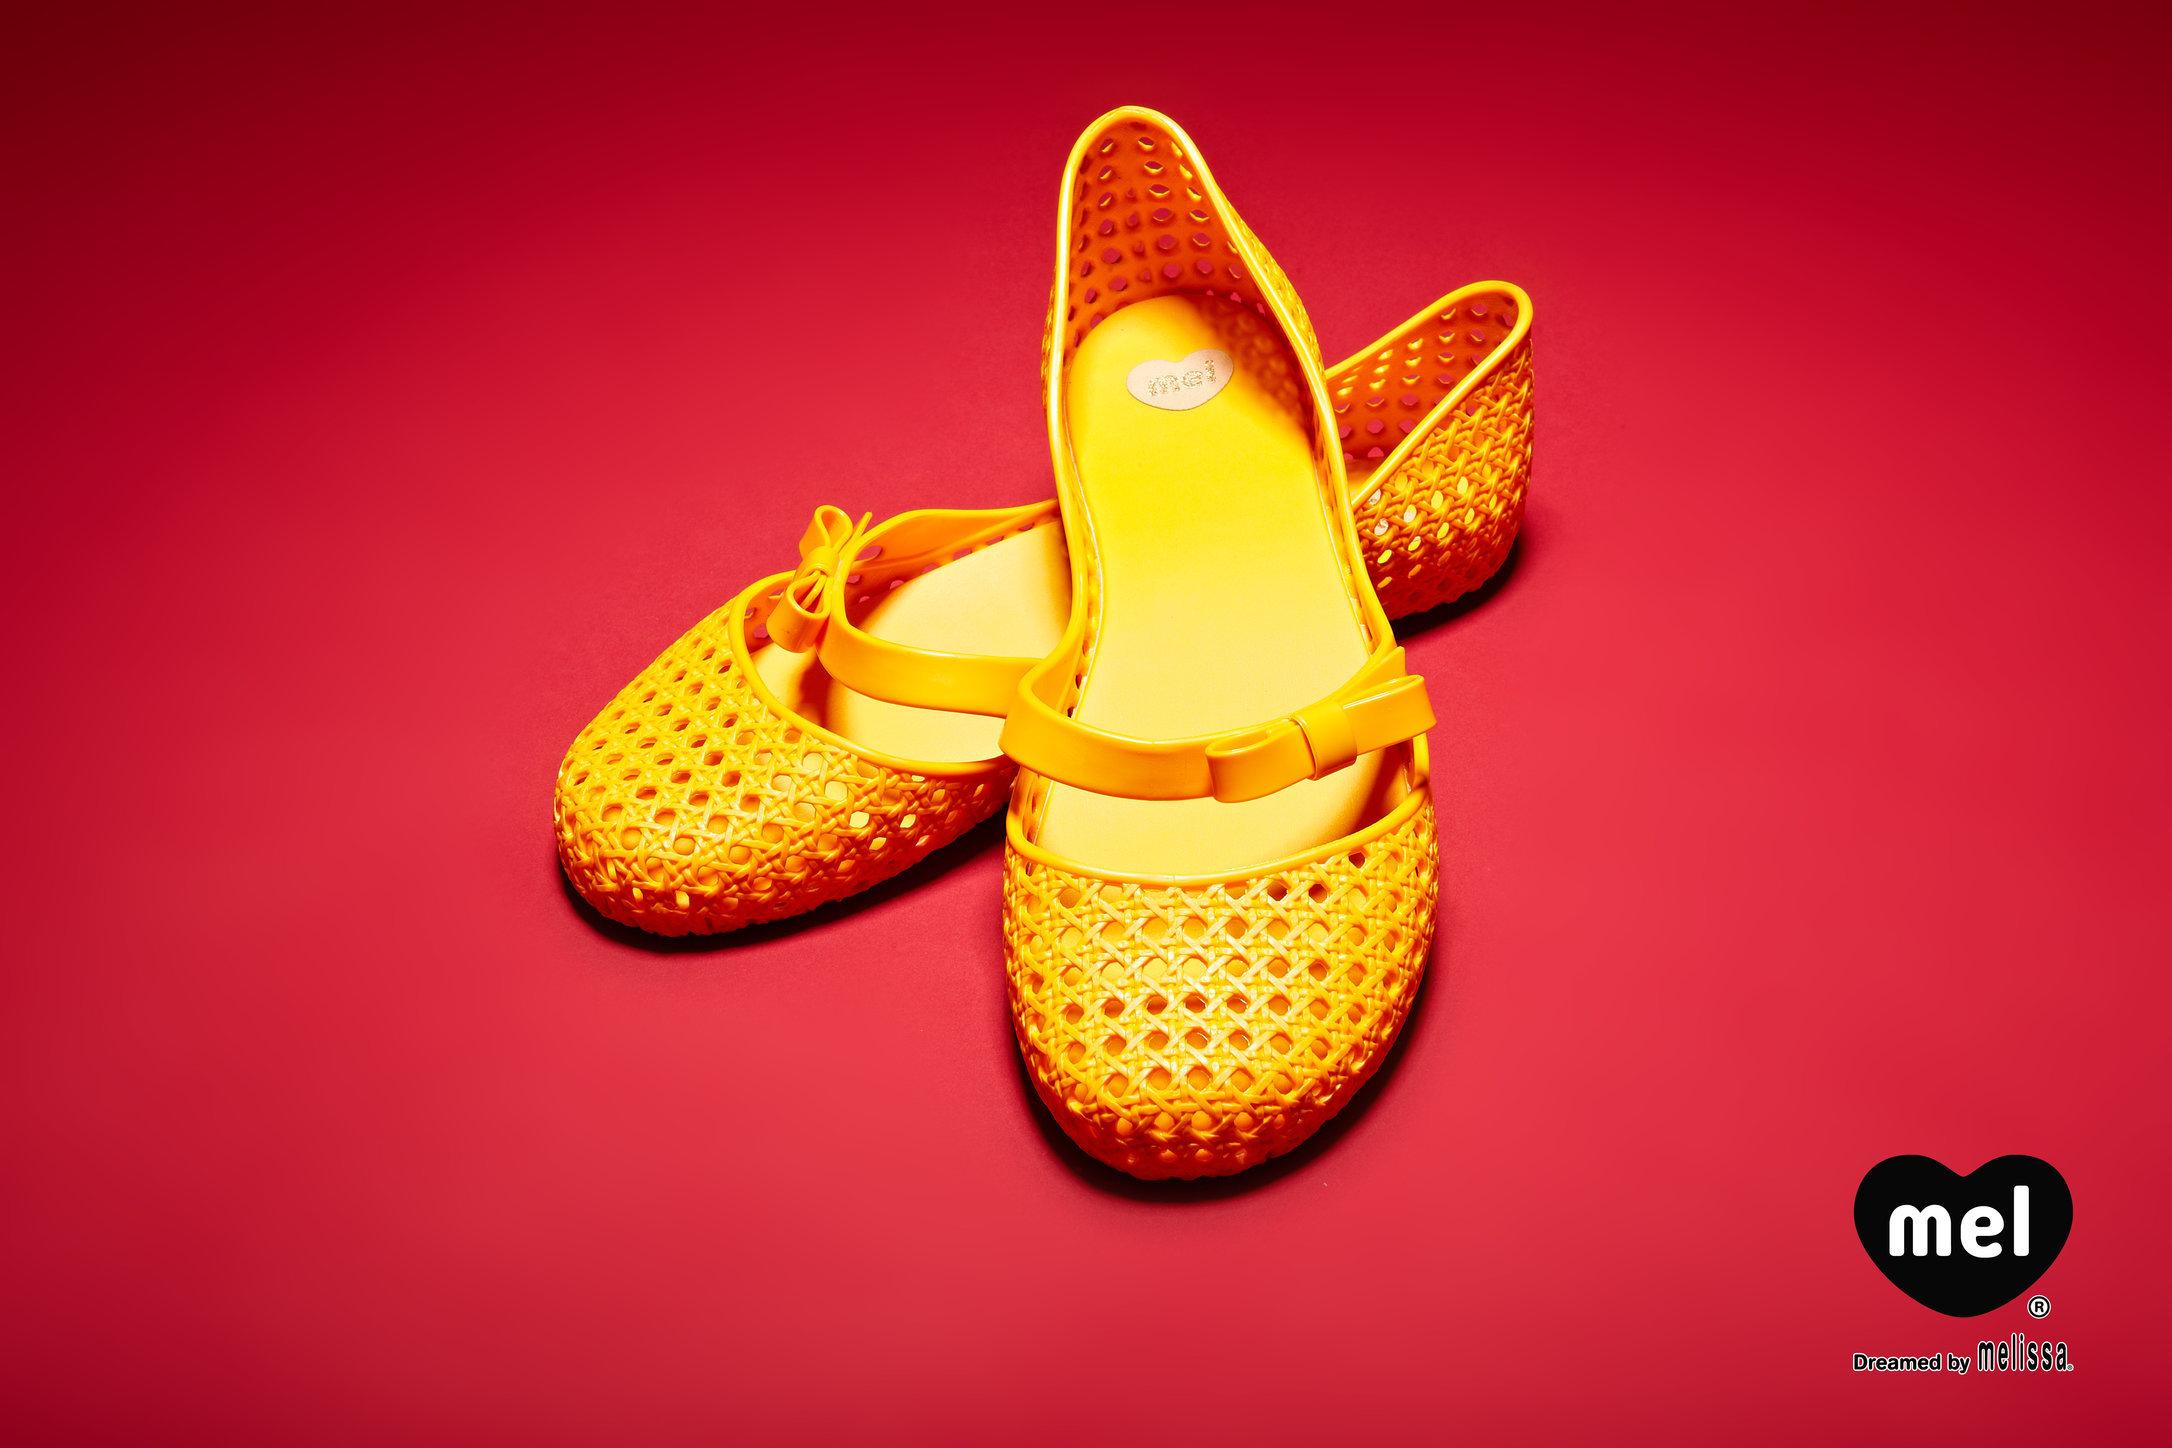 Mel shoes A/W12